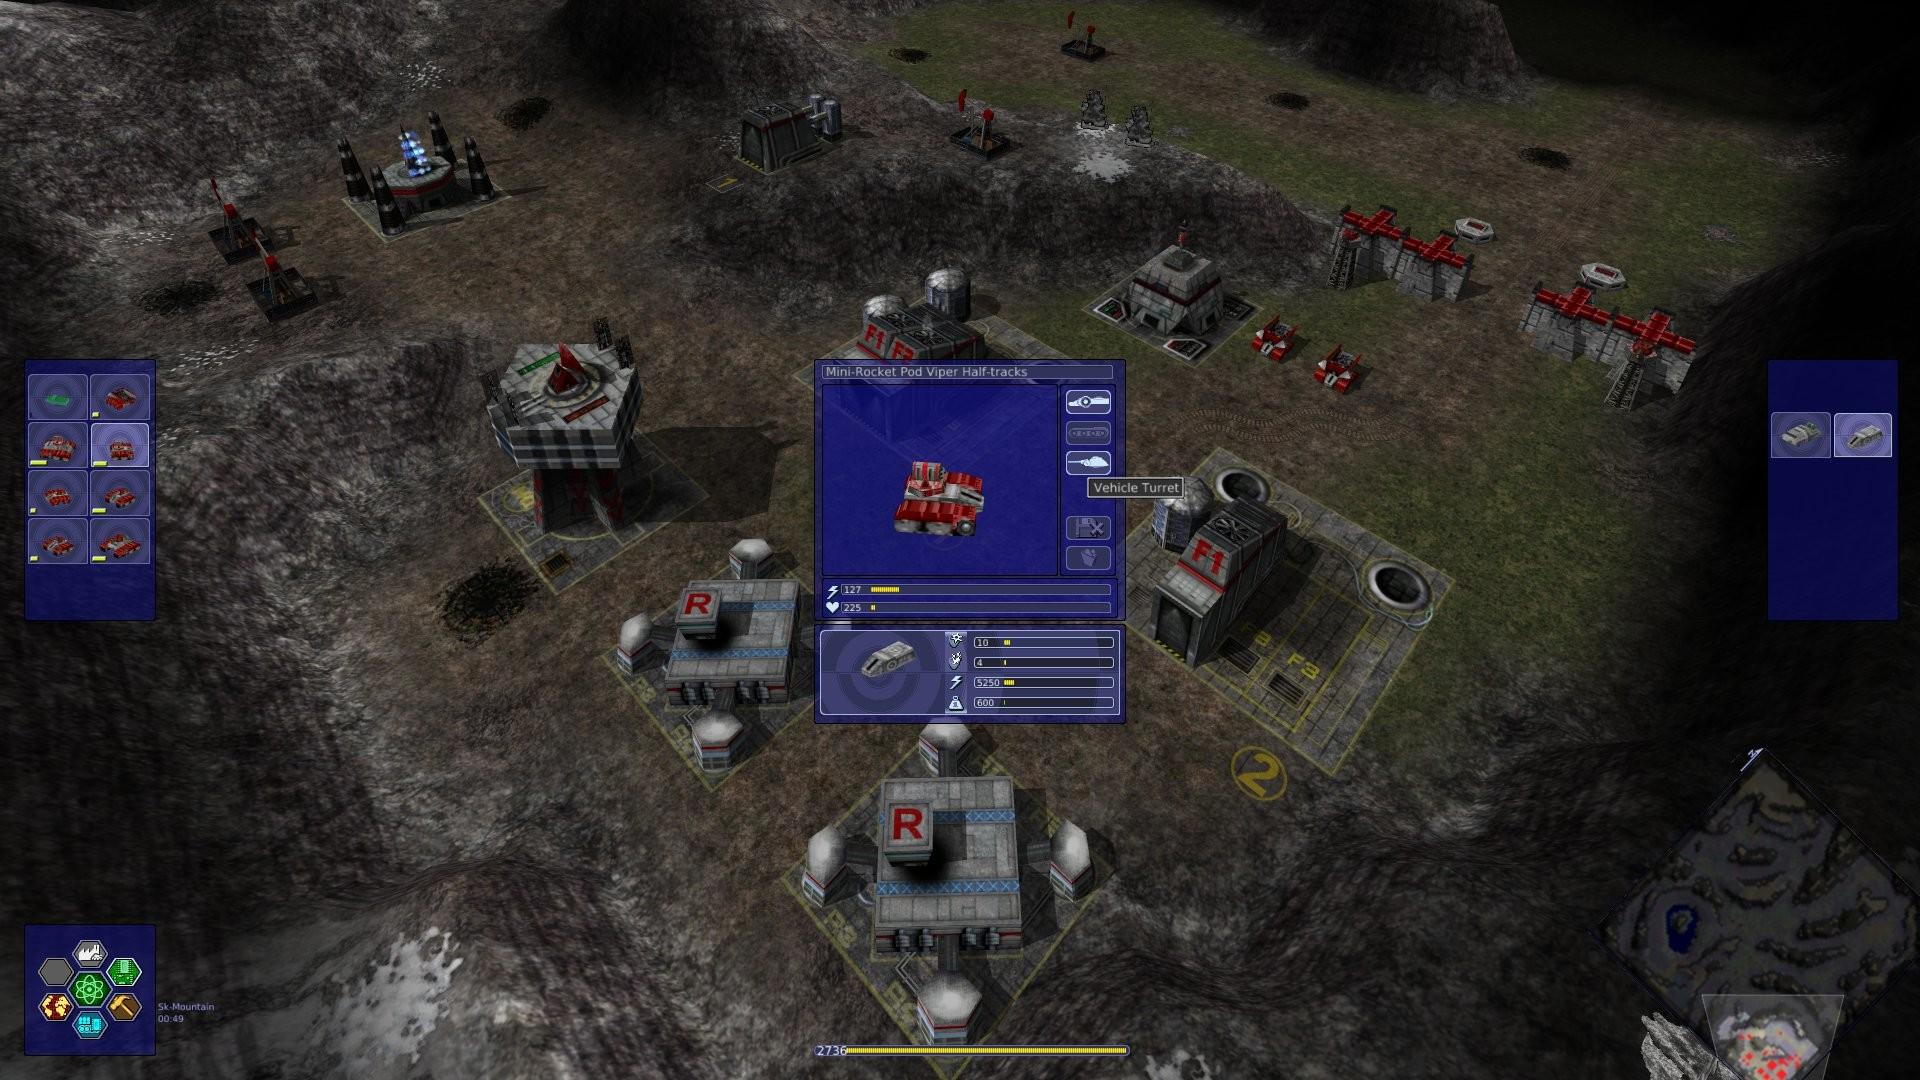 Screenshot 1 - Warzone 2100